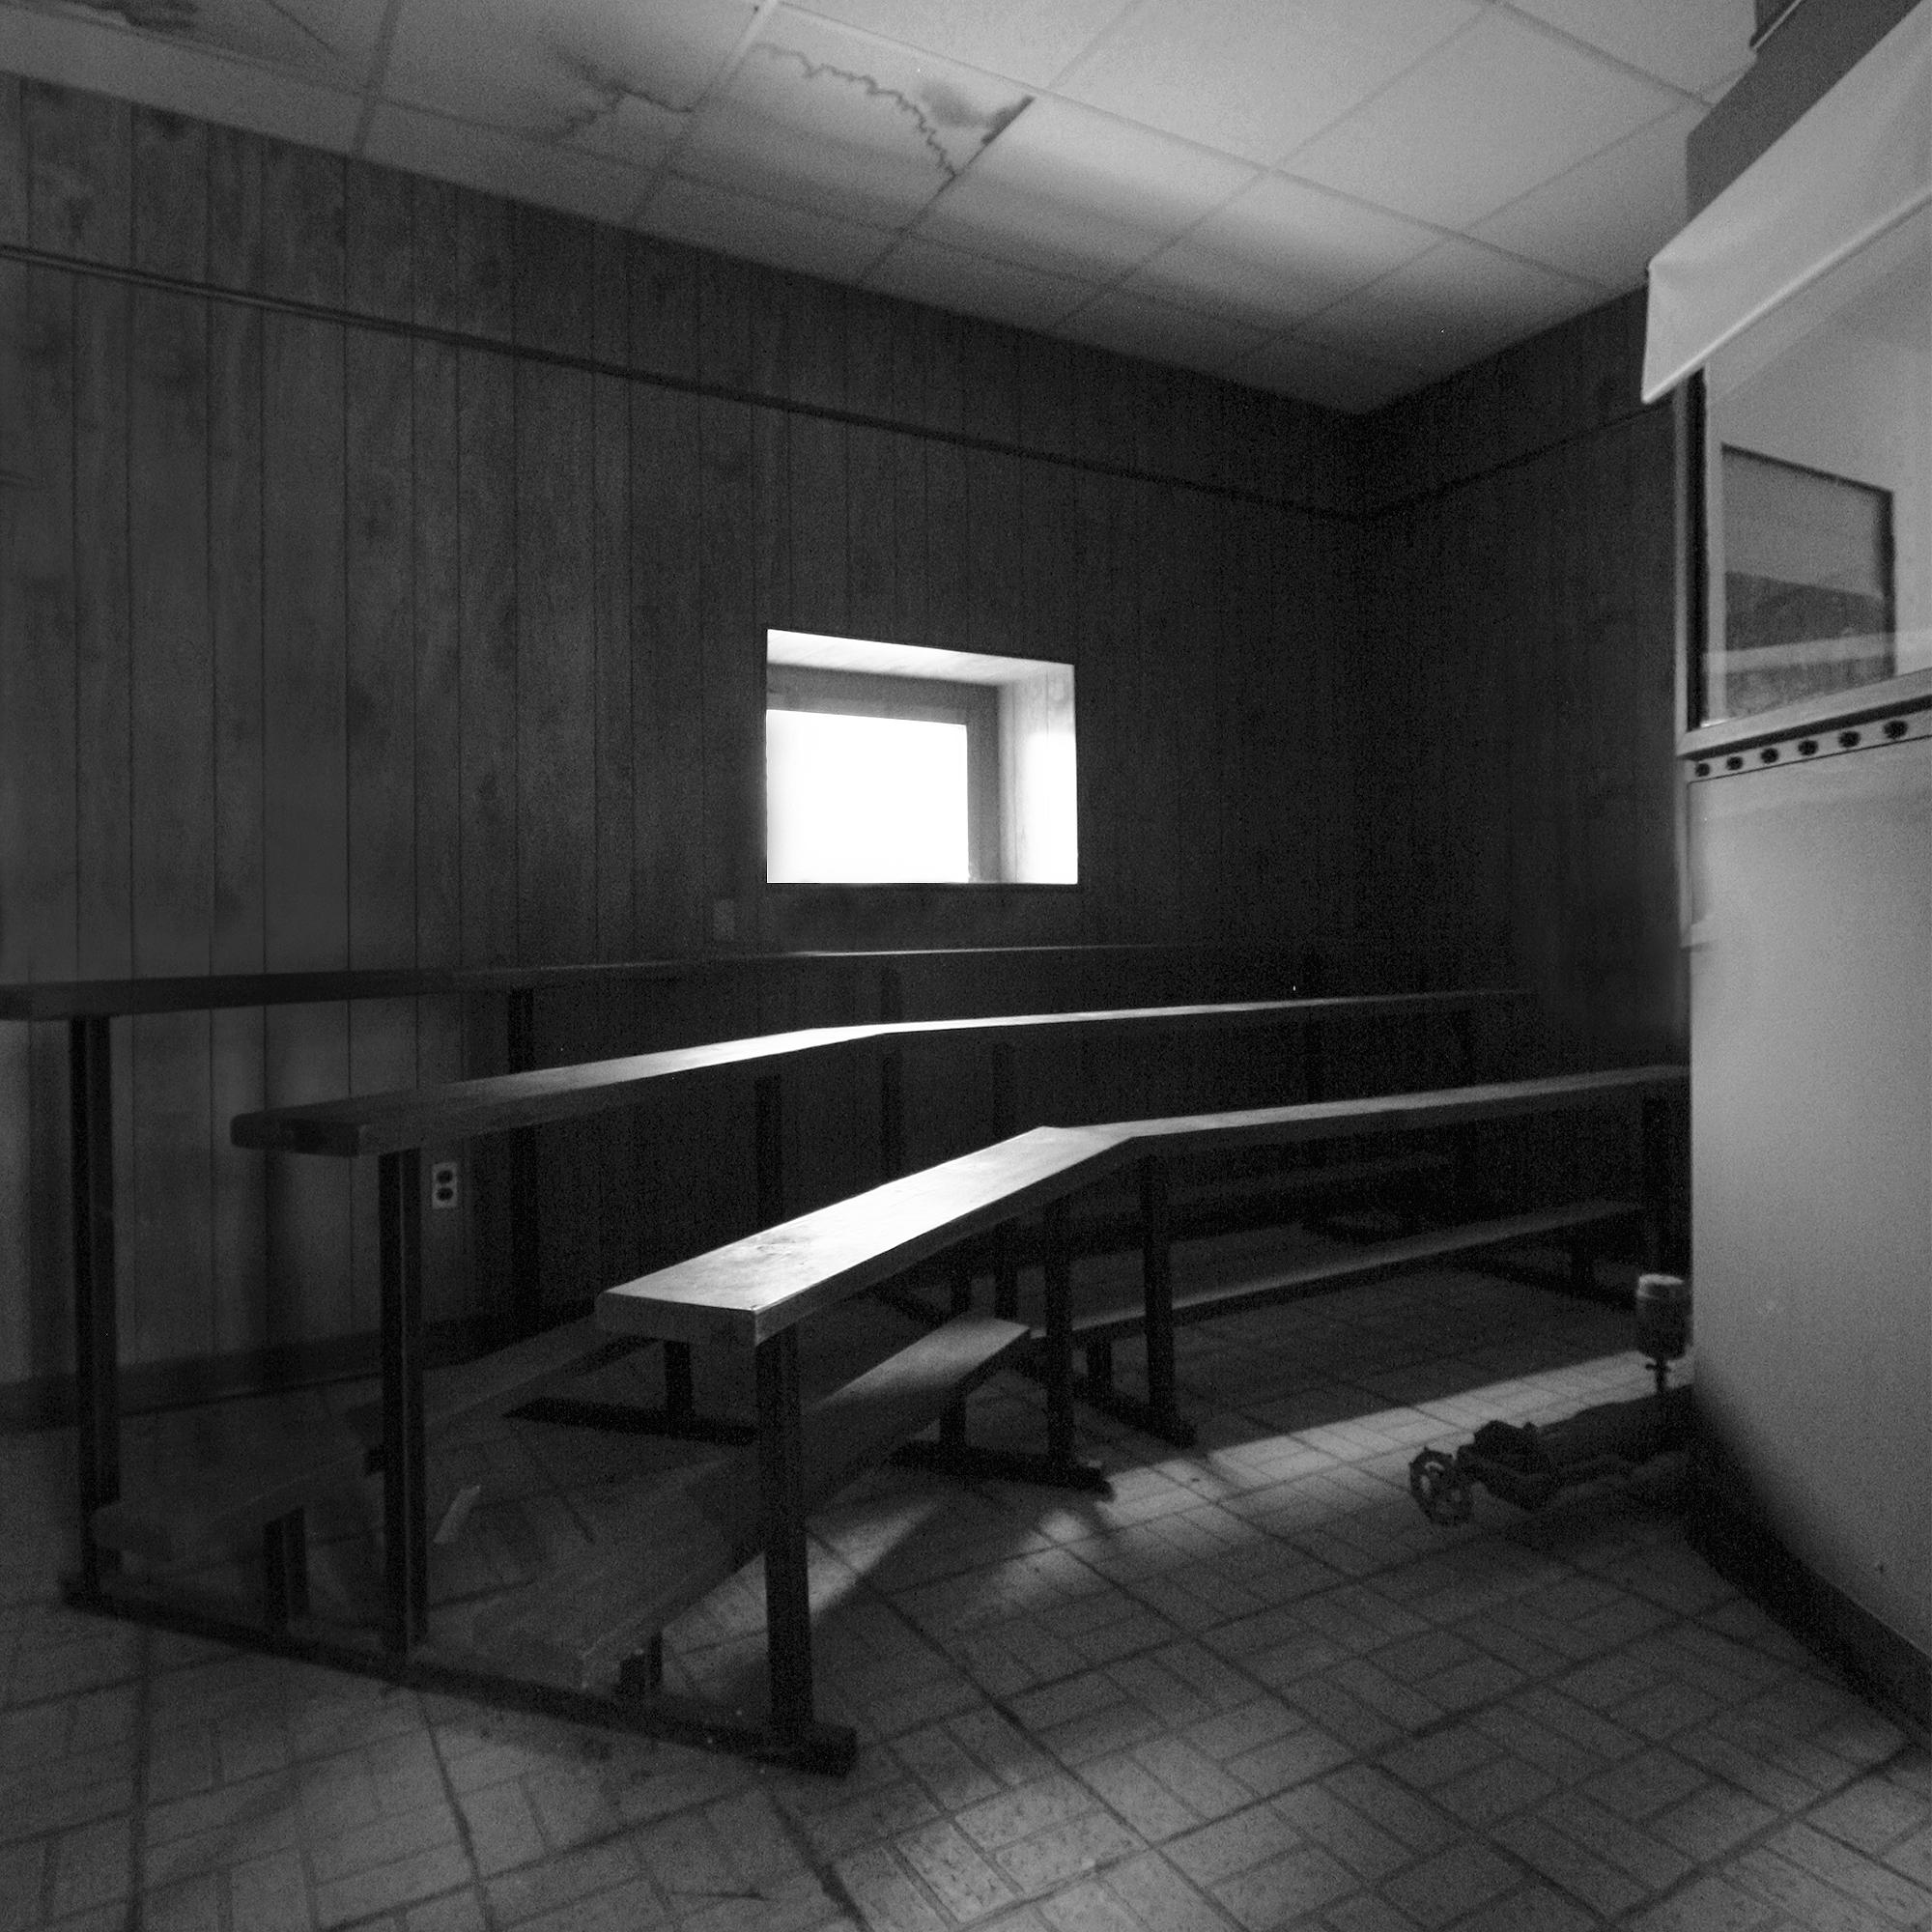 Brett Leigh_Dicks_Death Row 08.jpg